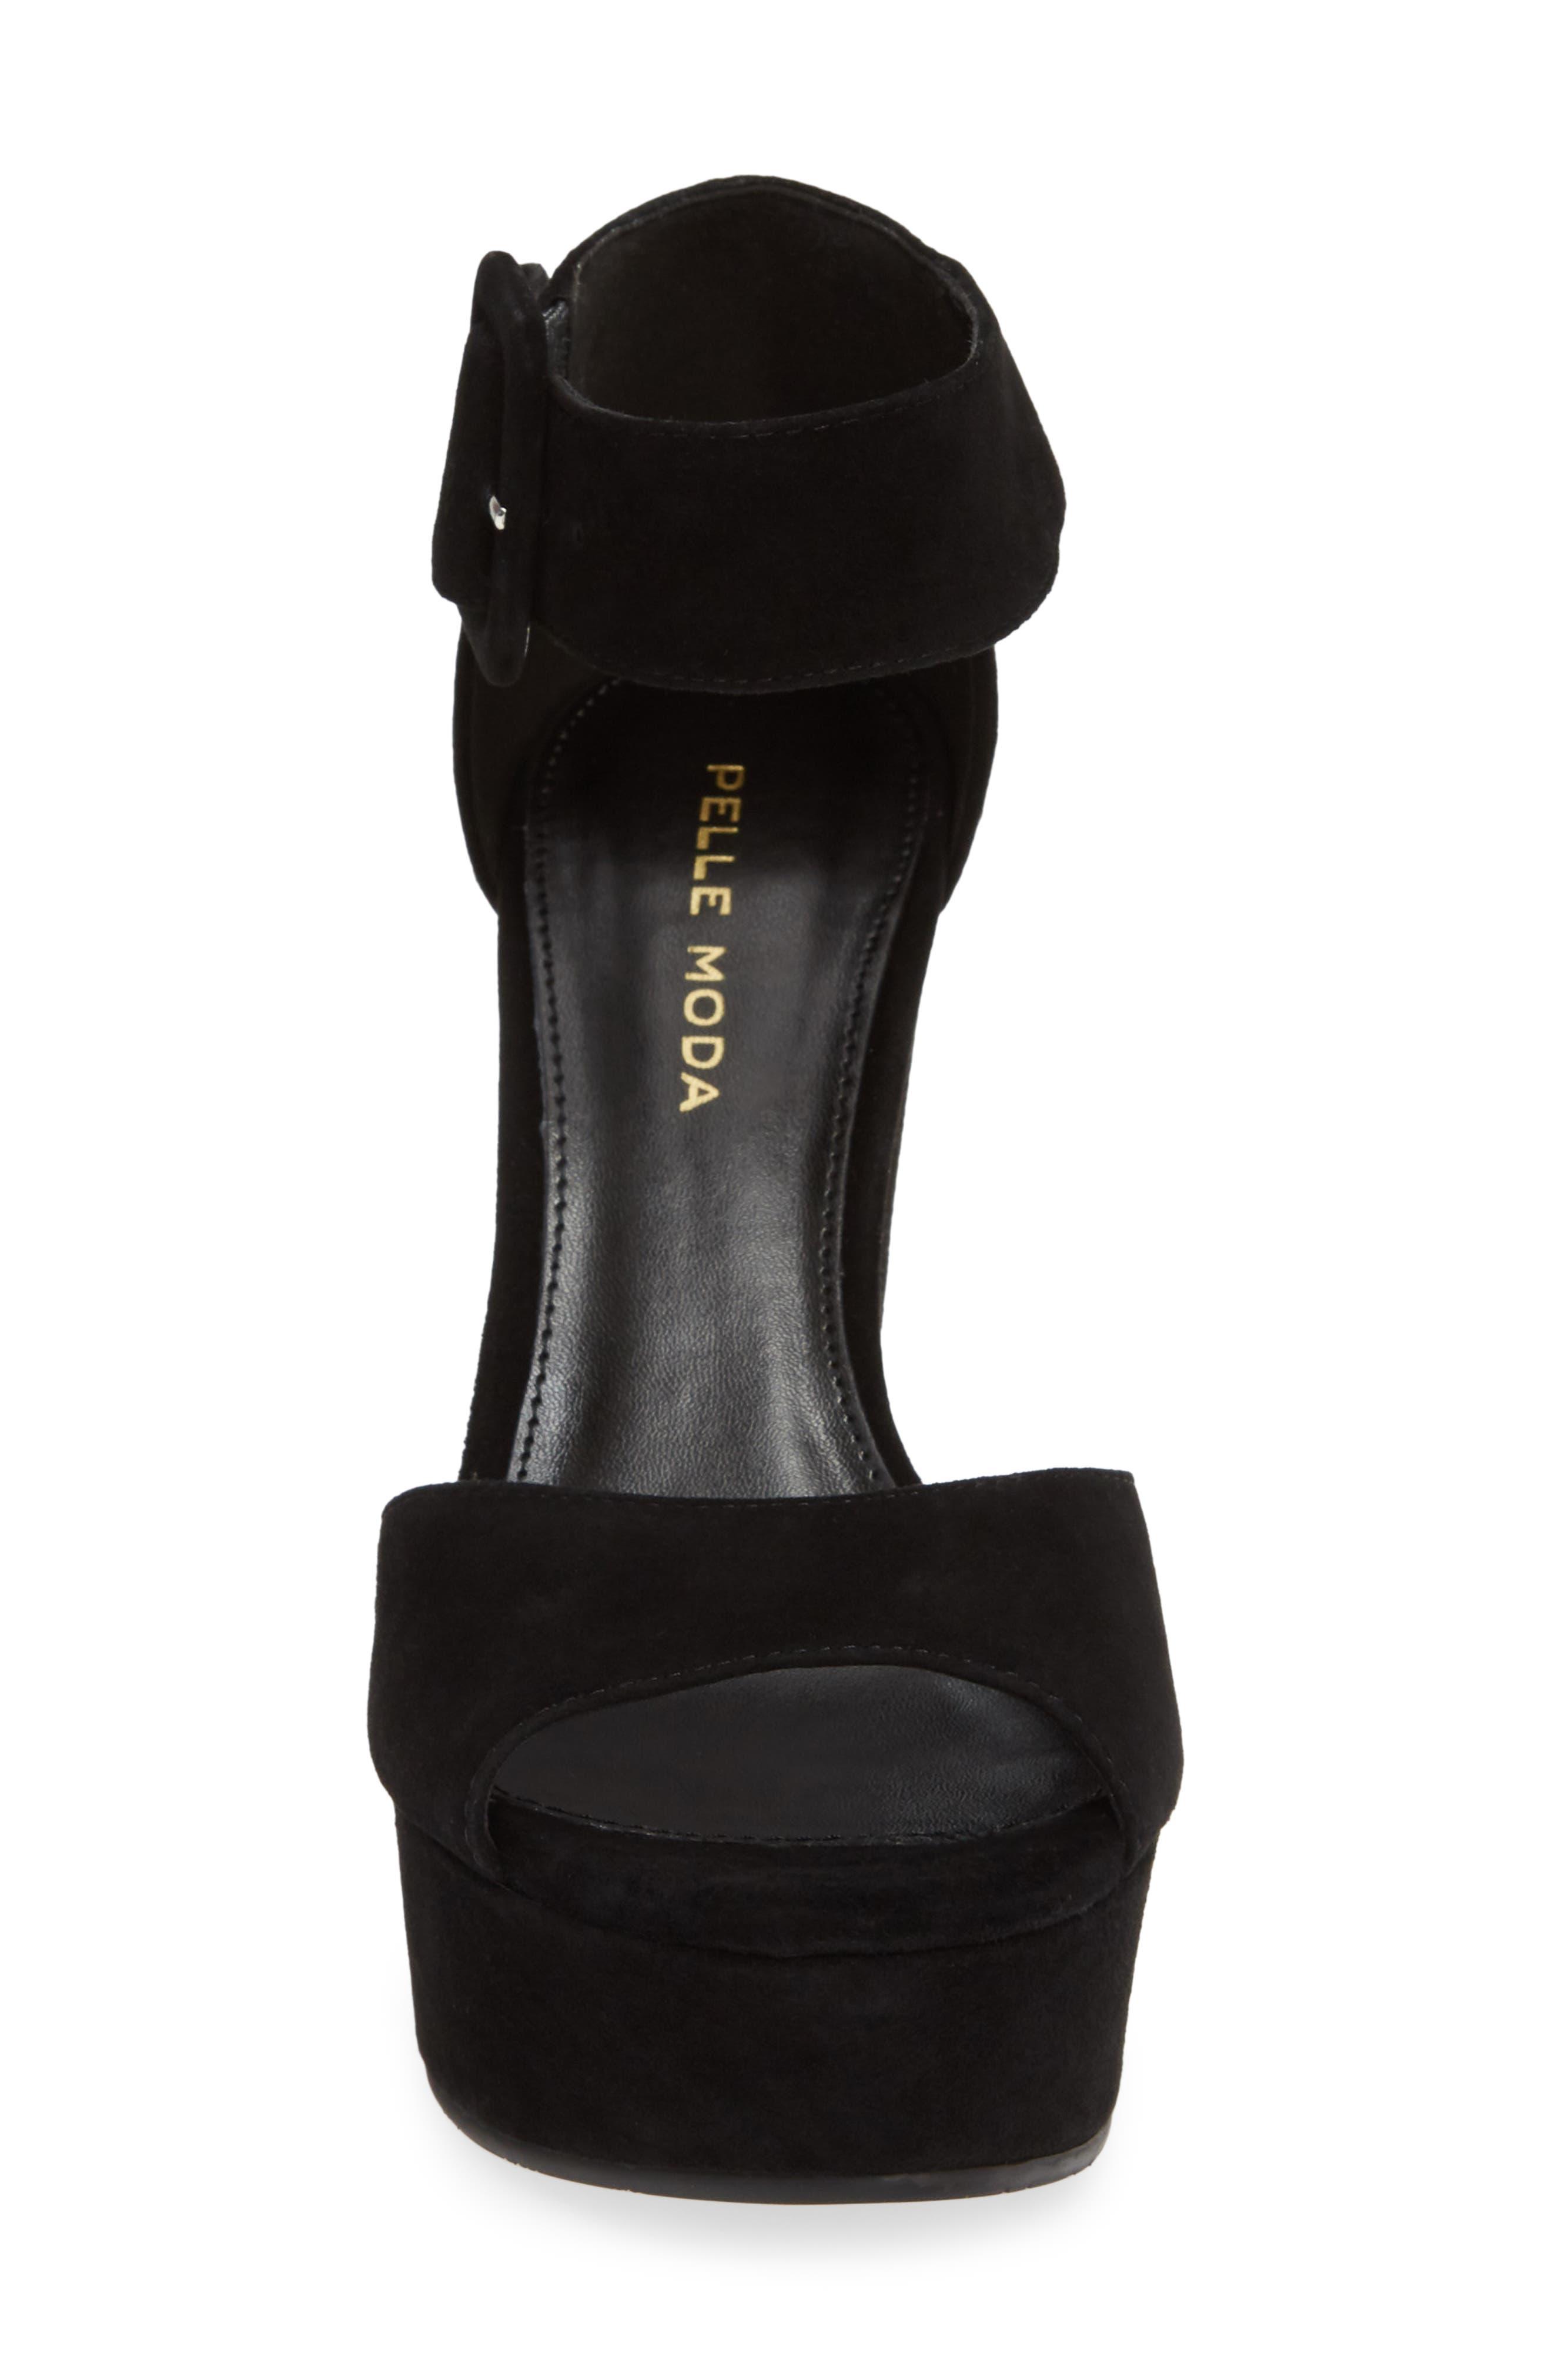 Ojai Platform Wedge Sandal,                             Alternate thumbnail 4, color,                             BLACK SUEDE